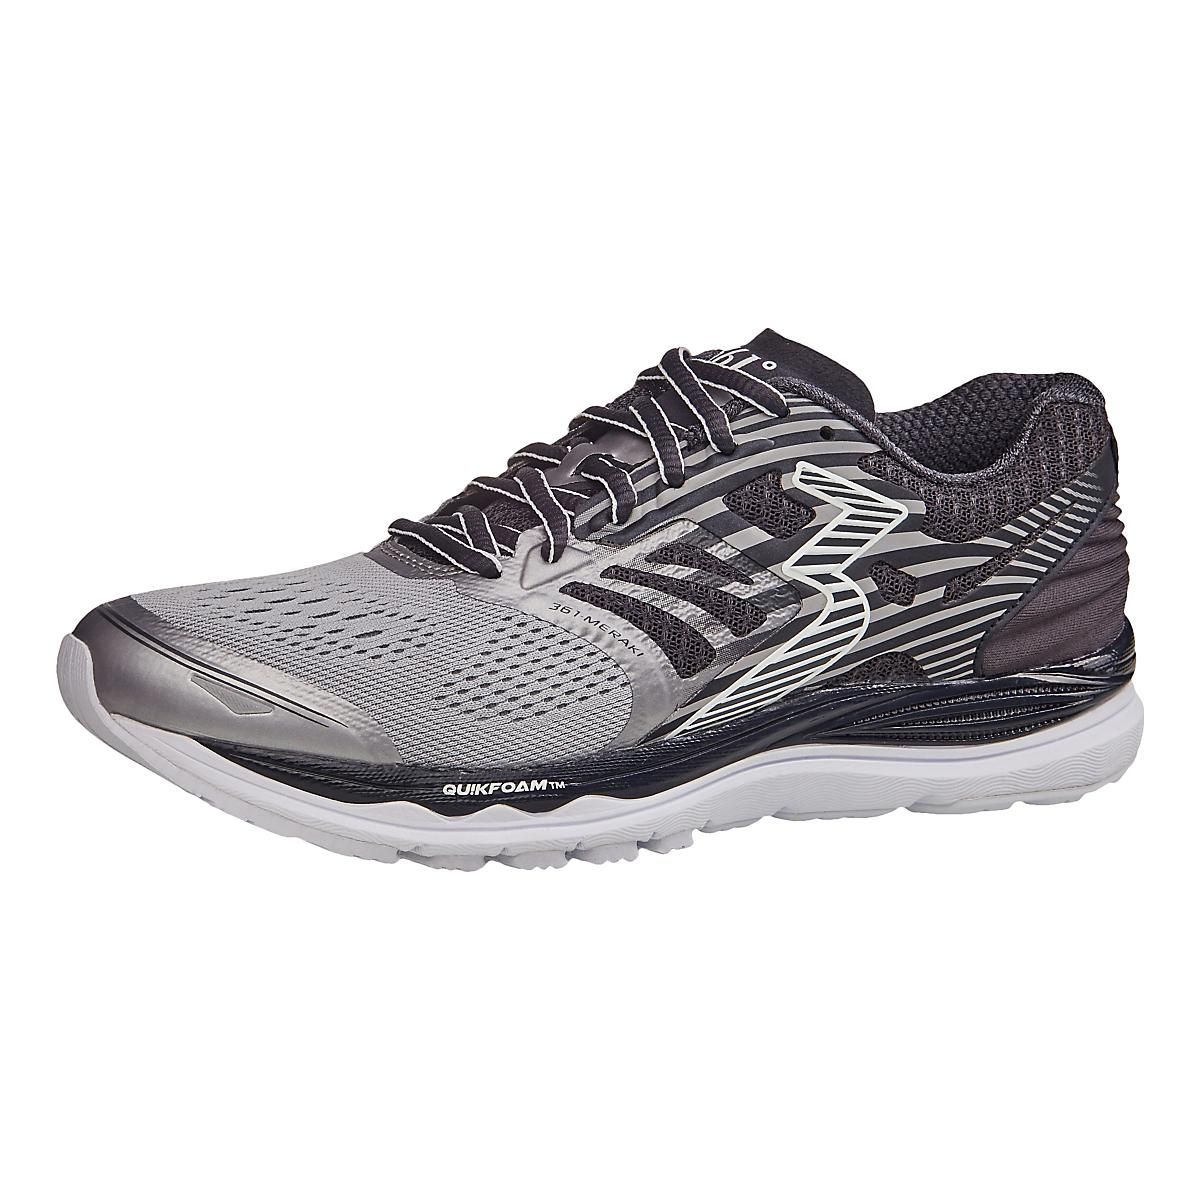 Degrees 361 Meraki Running Neutral. 9, Size Mens shoes